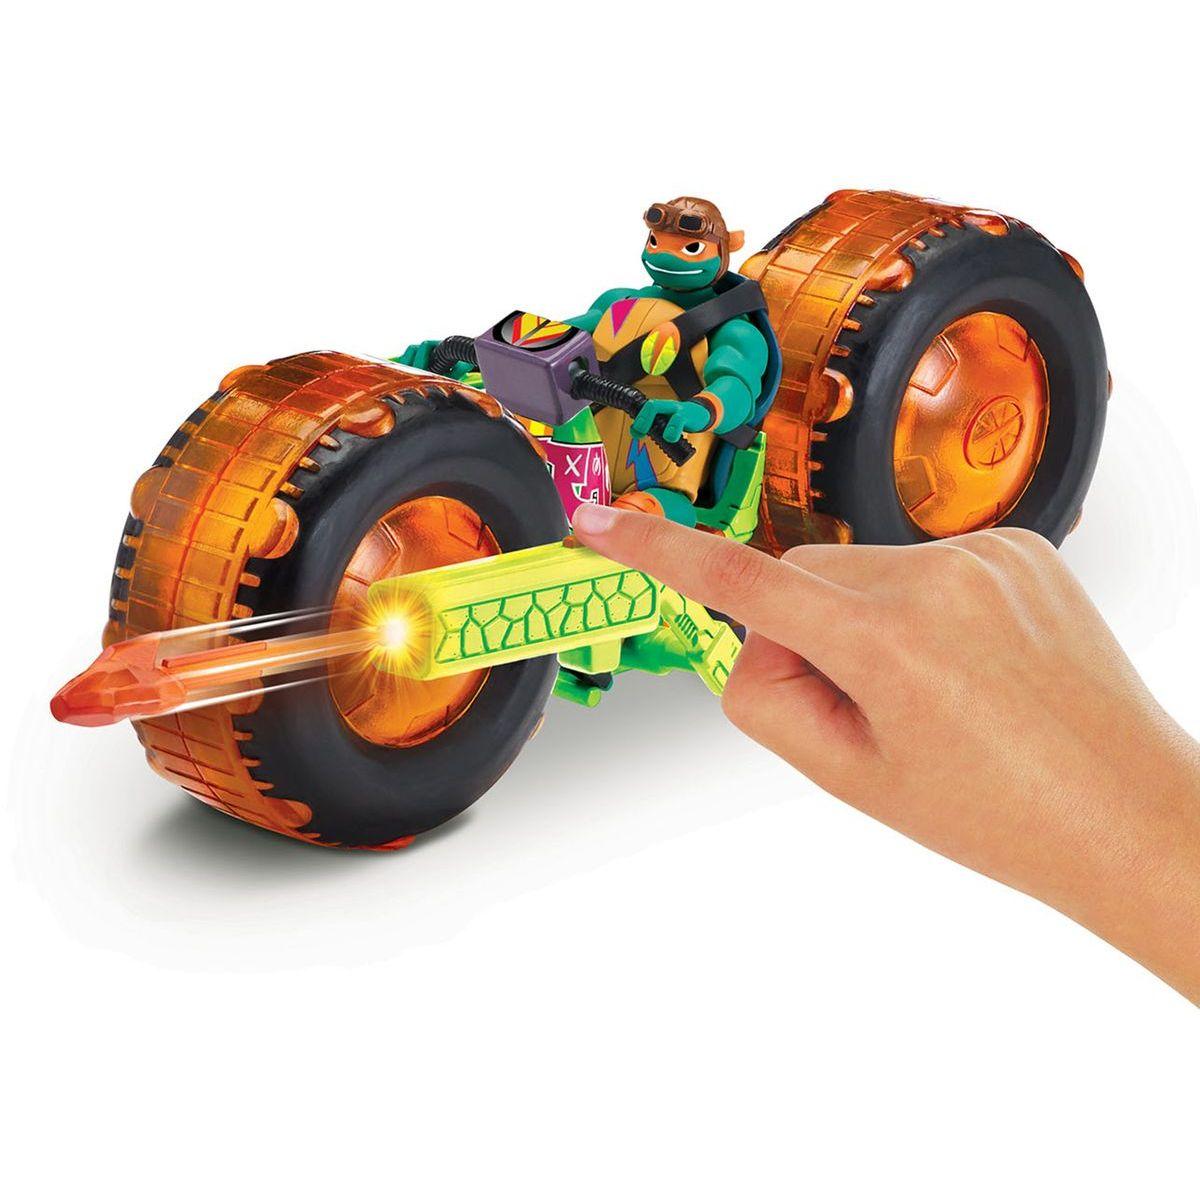 Teenage Mutant Ninja Turtles motorka s figurkou Michelangelo - Poškodený obal